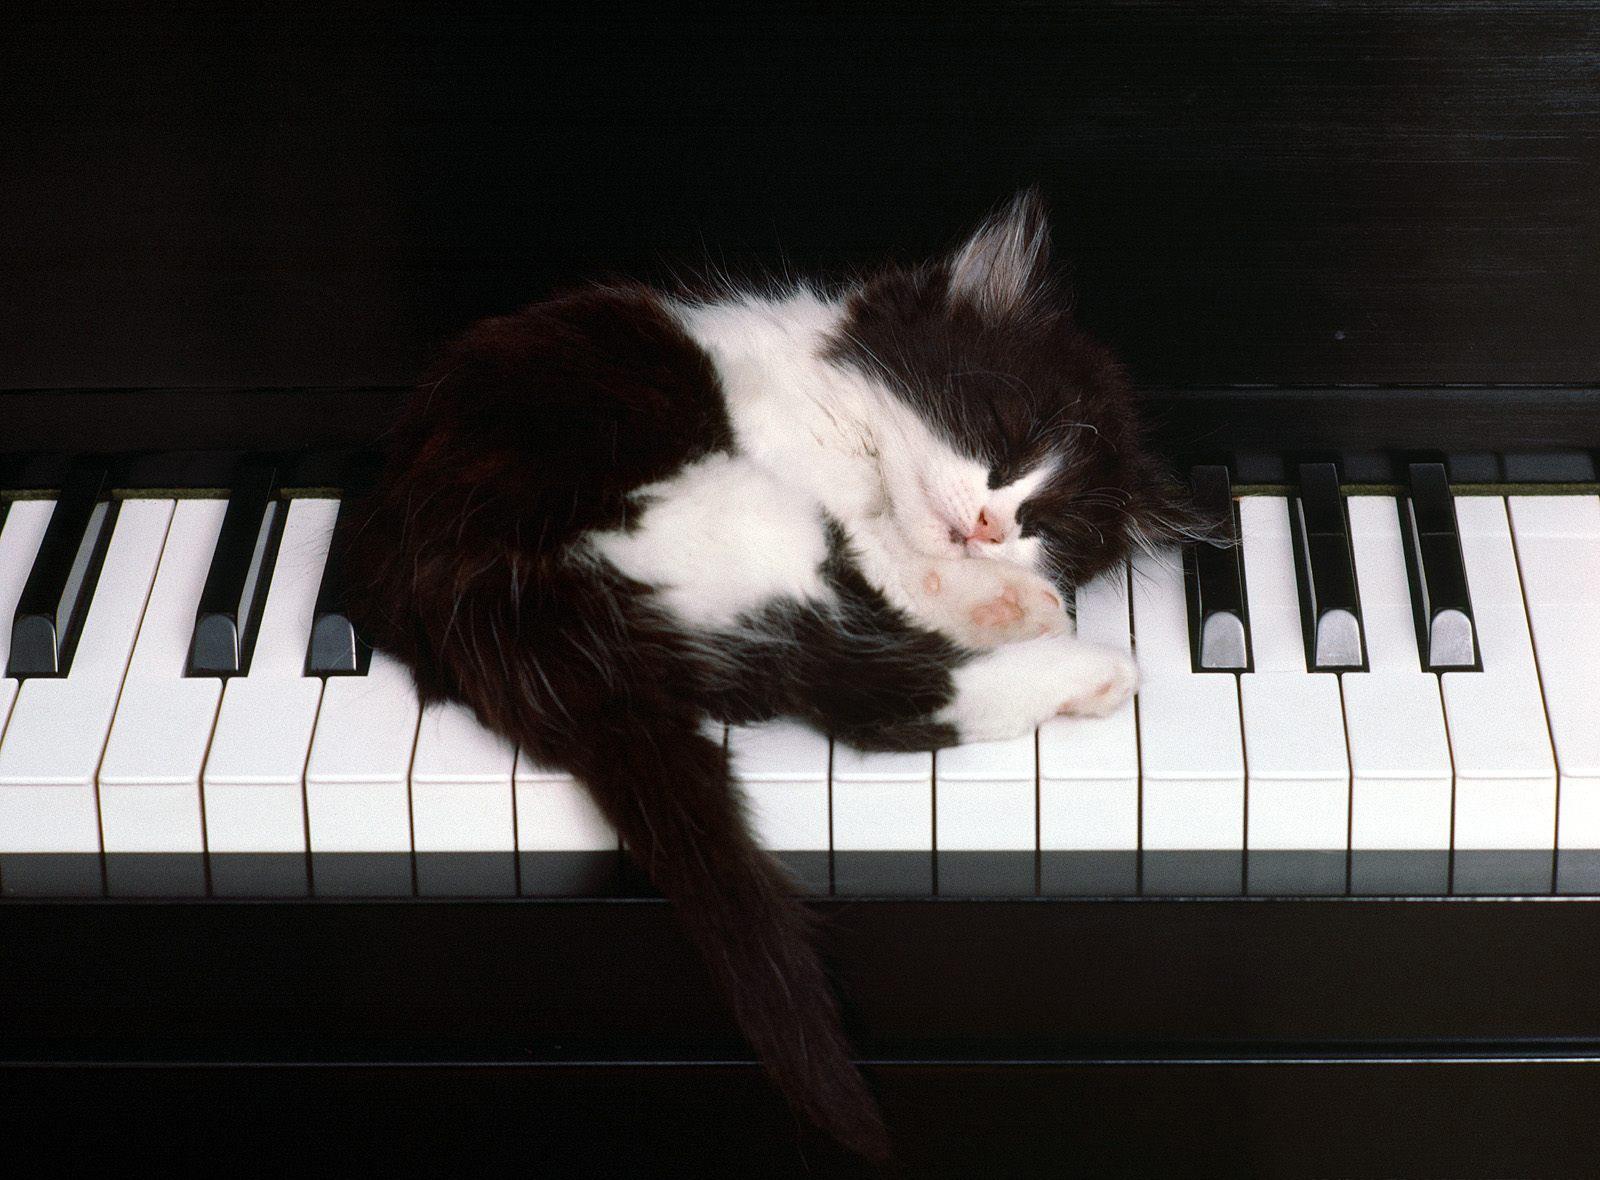 http://3.bp.blogspot.com/_sRGU_JXOz6E/TRHaZWylK1I/AAAAAAAAADA/7vF_uaI0Kew/s1600/black-white-cat-wallpaper-1600x1200%255B1%255D.jpg